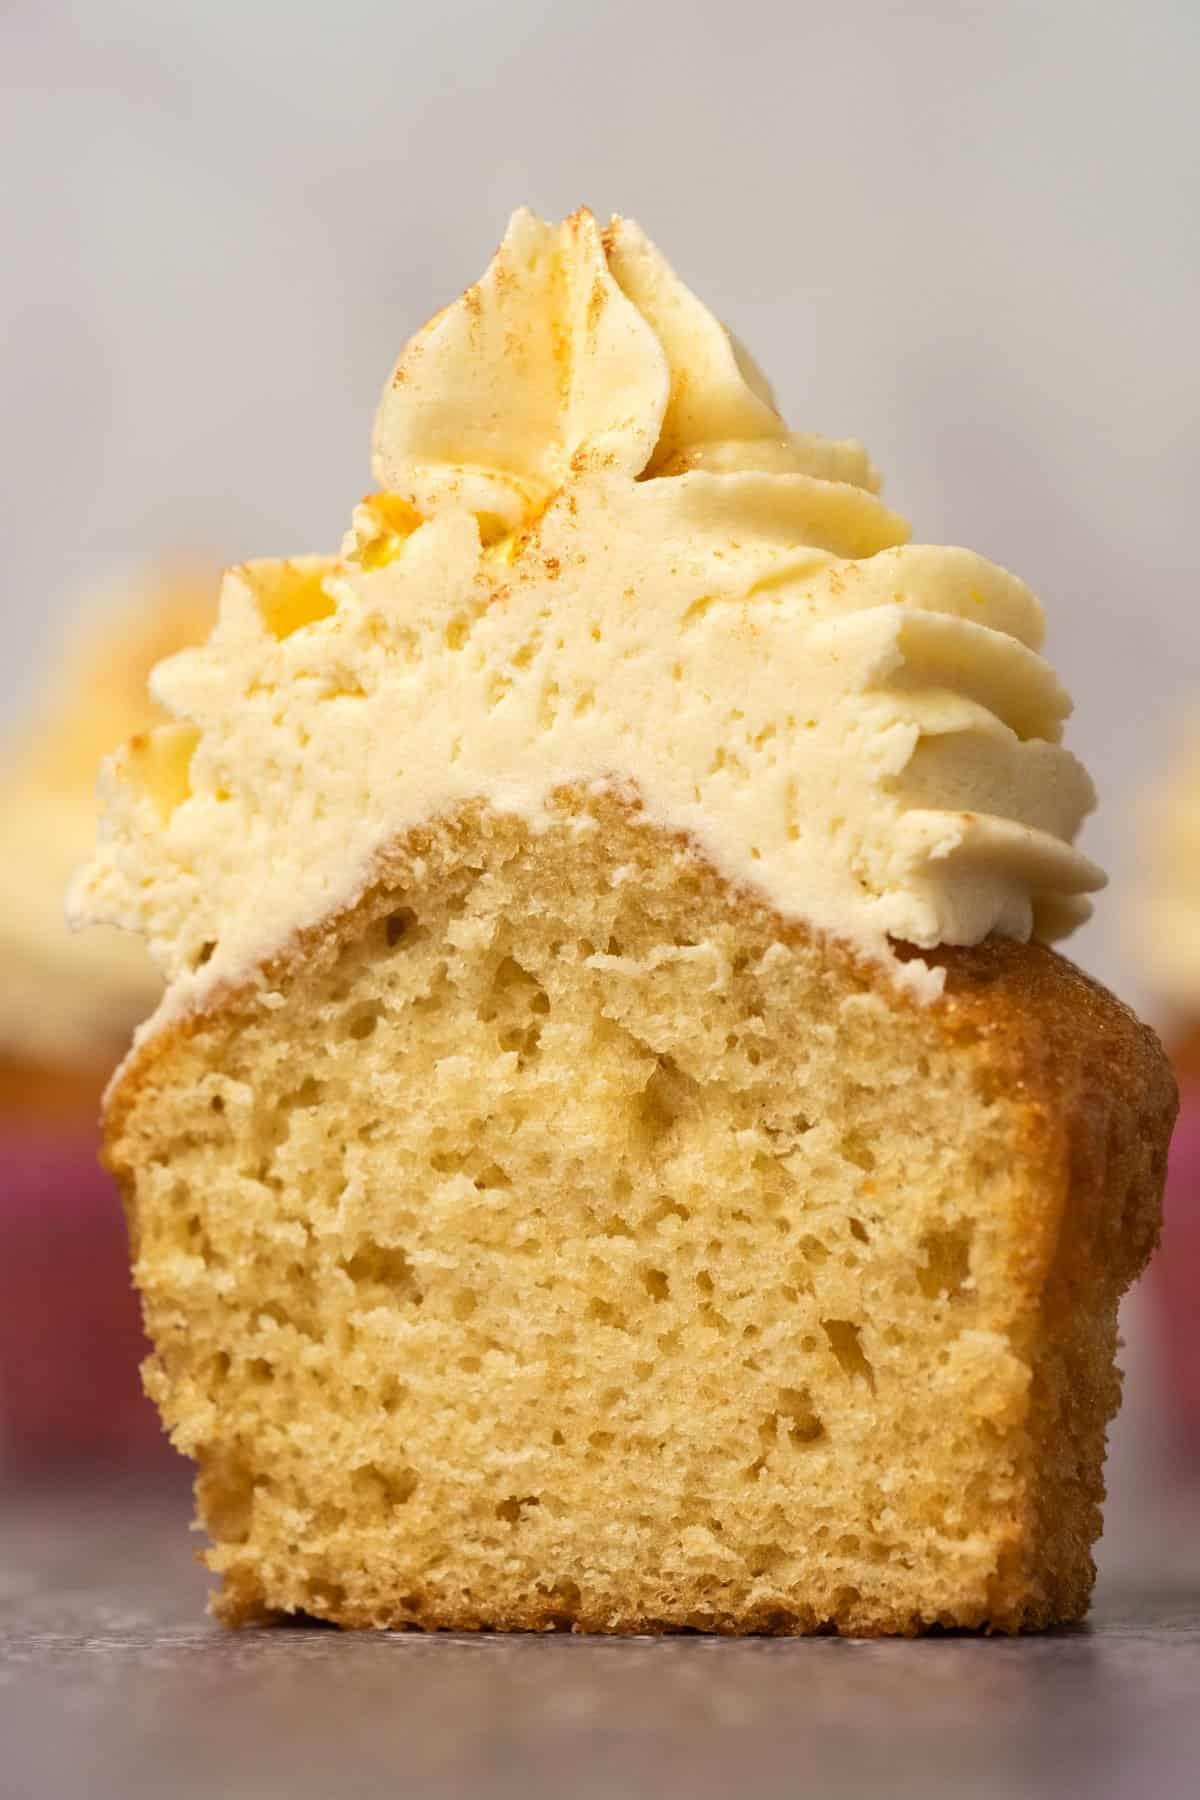 Vanilla cupcake cut in half to show the center.